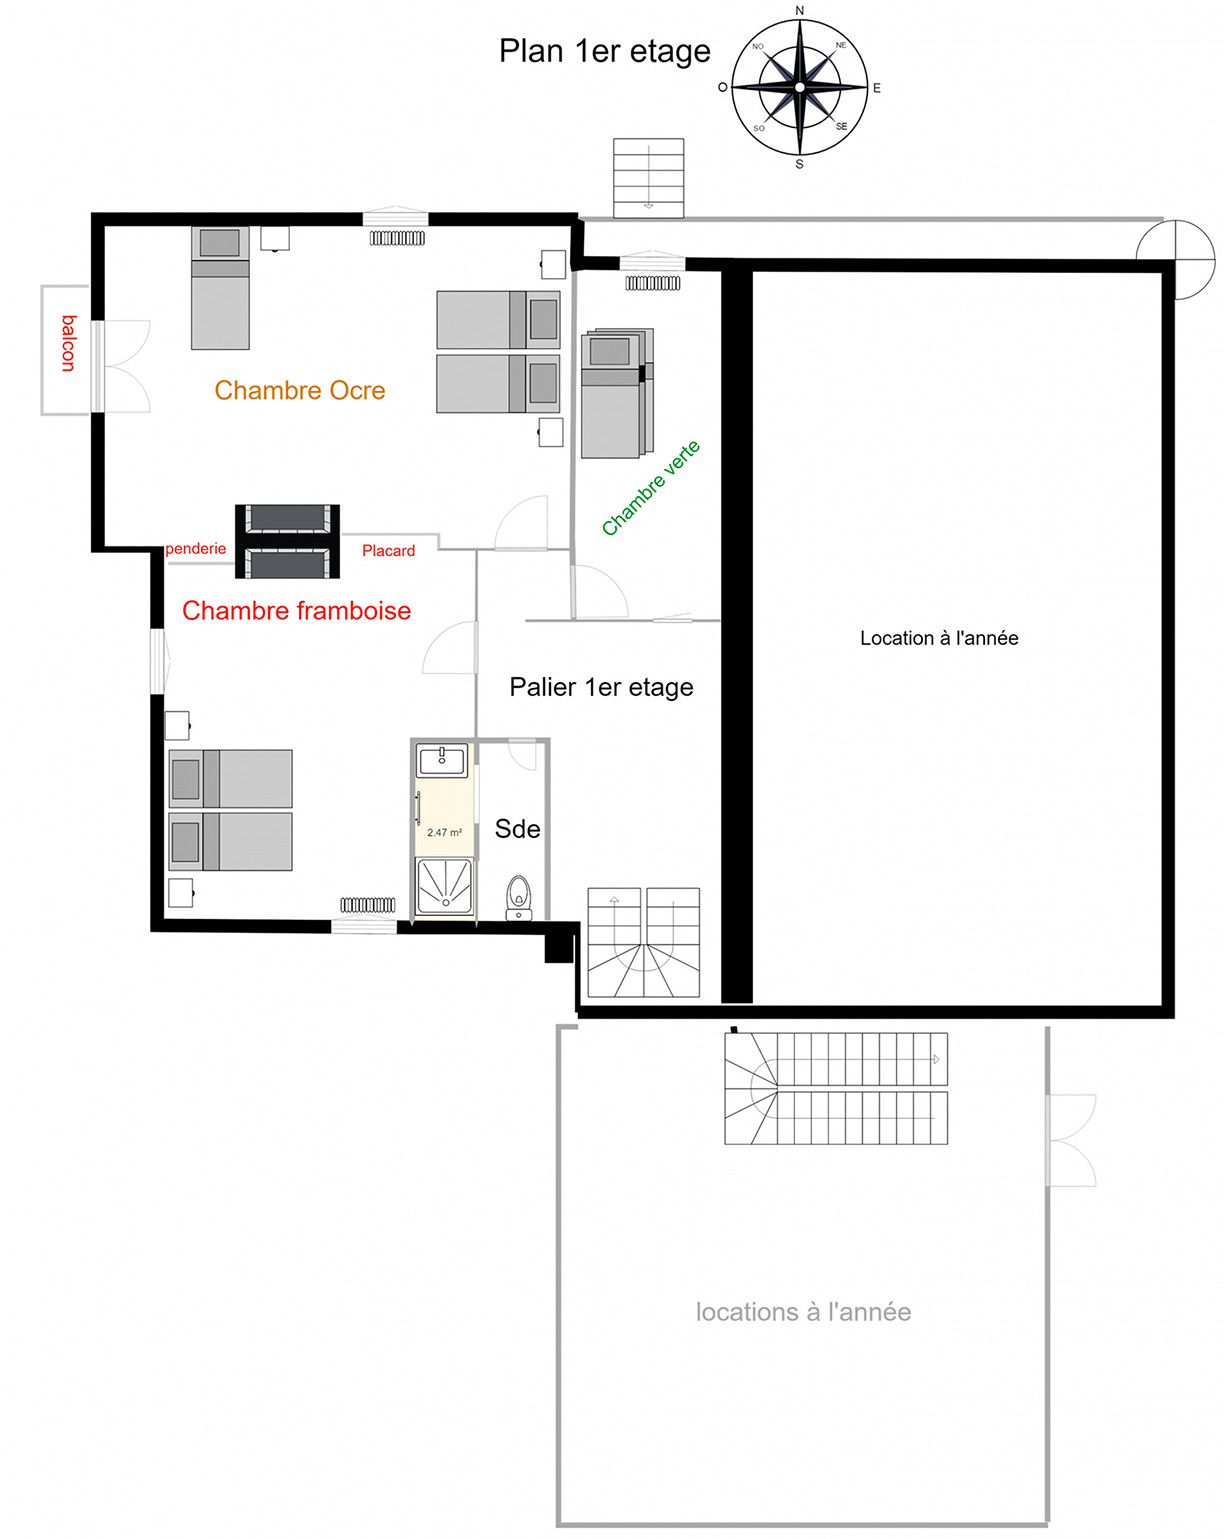 Plan du 1er étage de Branville